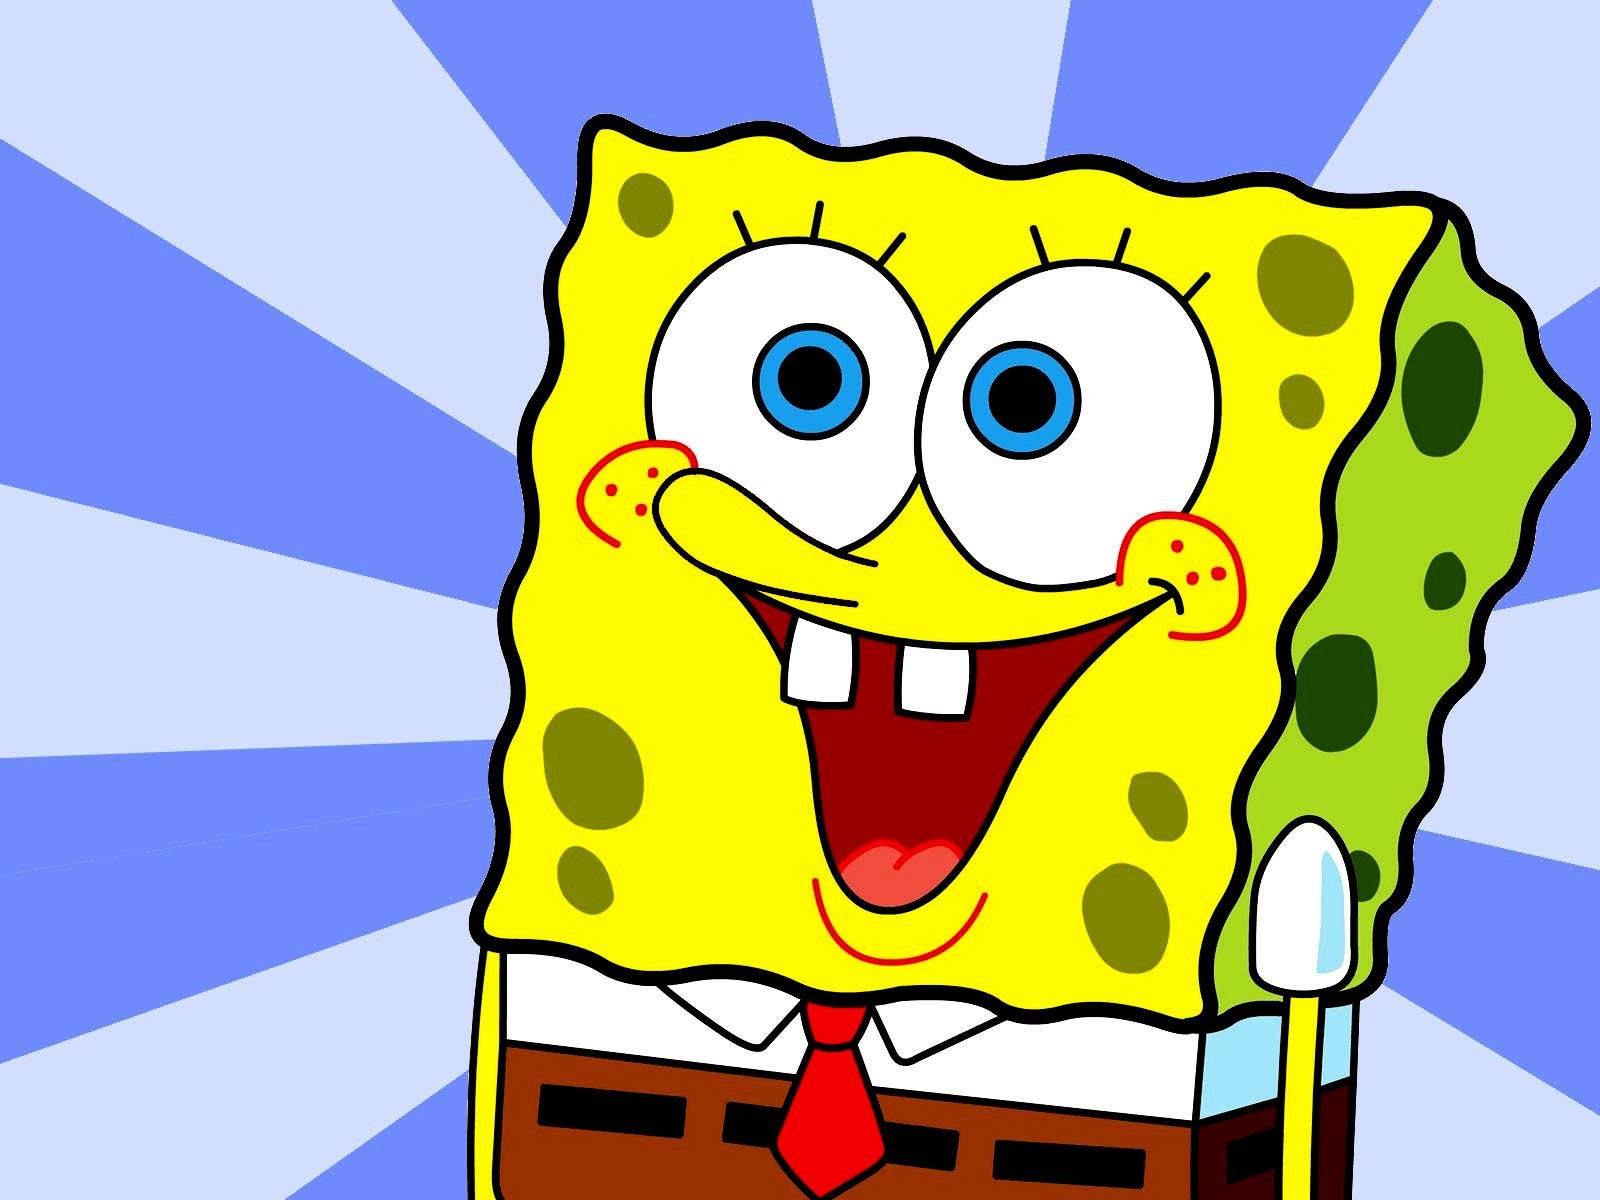 Free Download Spongebob Images Wallpaper 1600x1200px